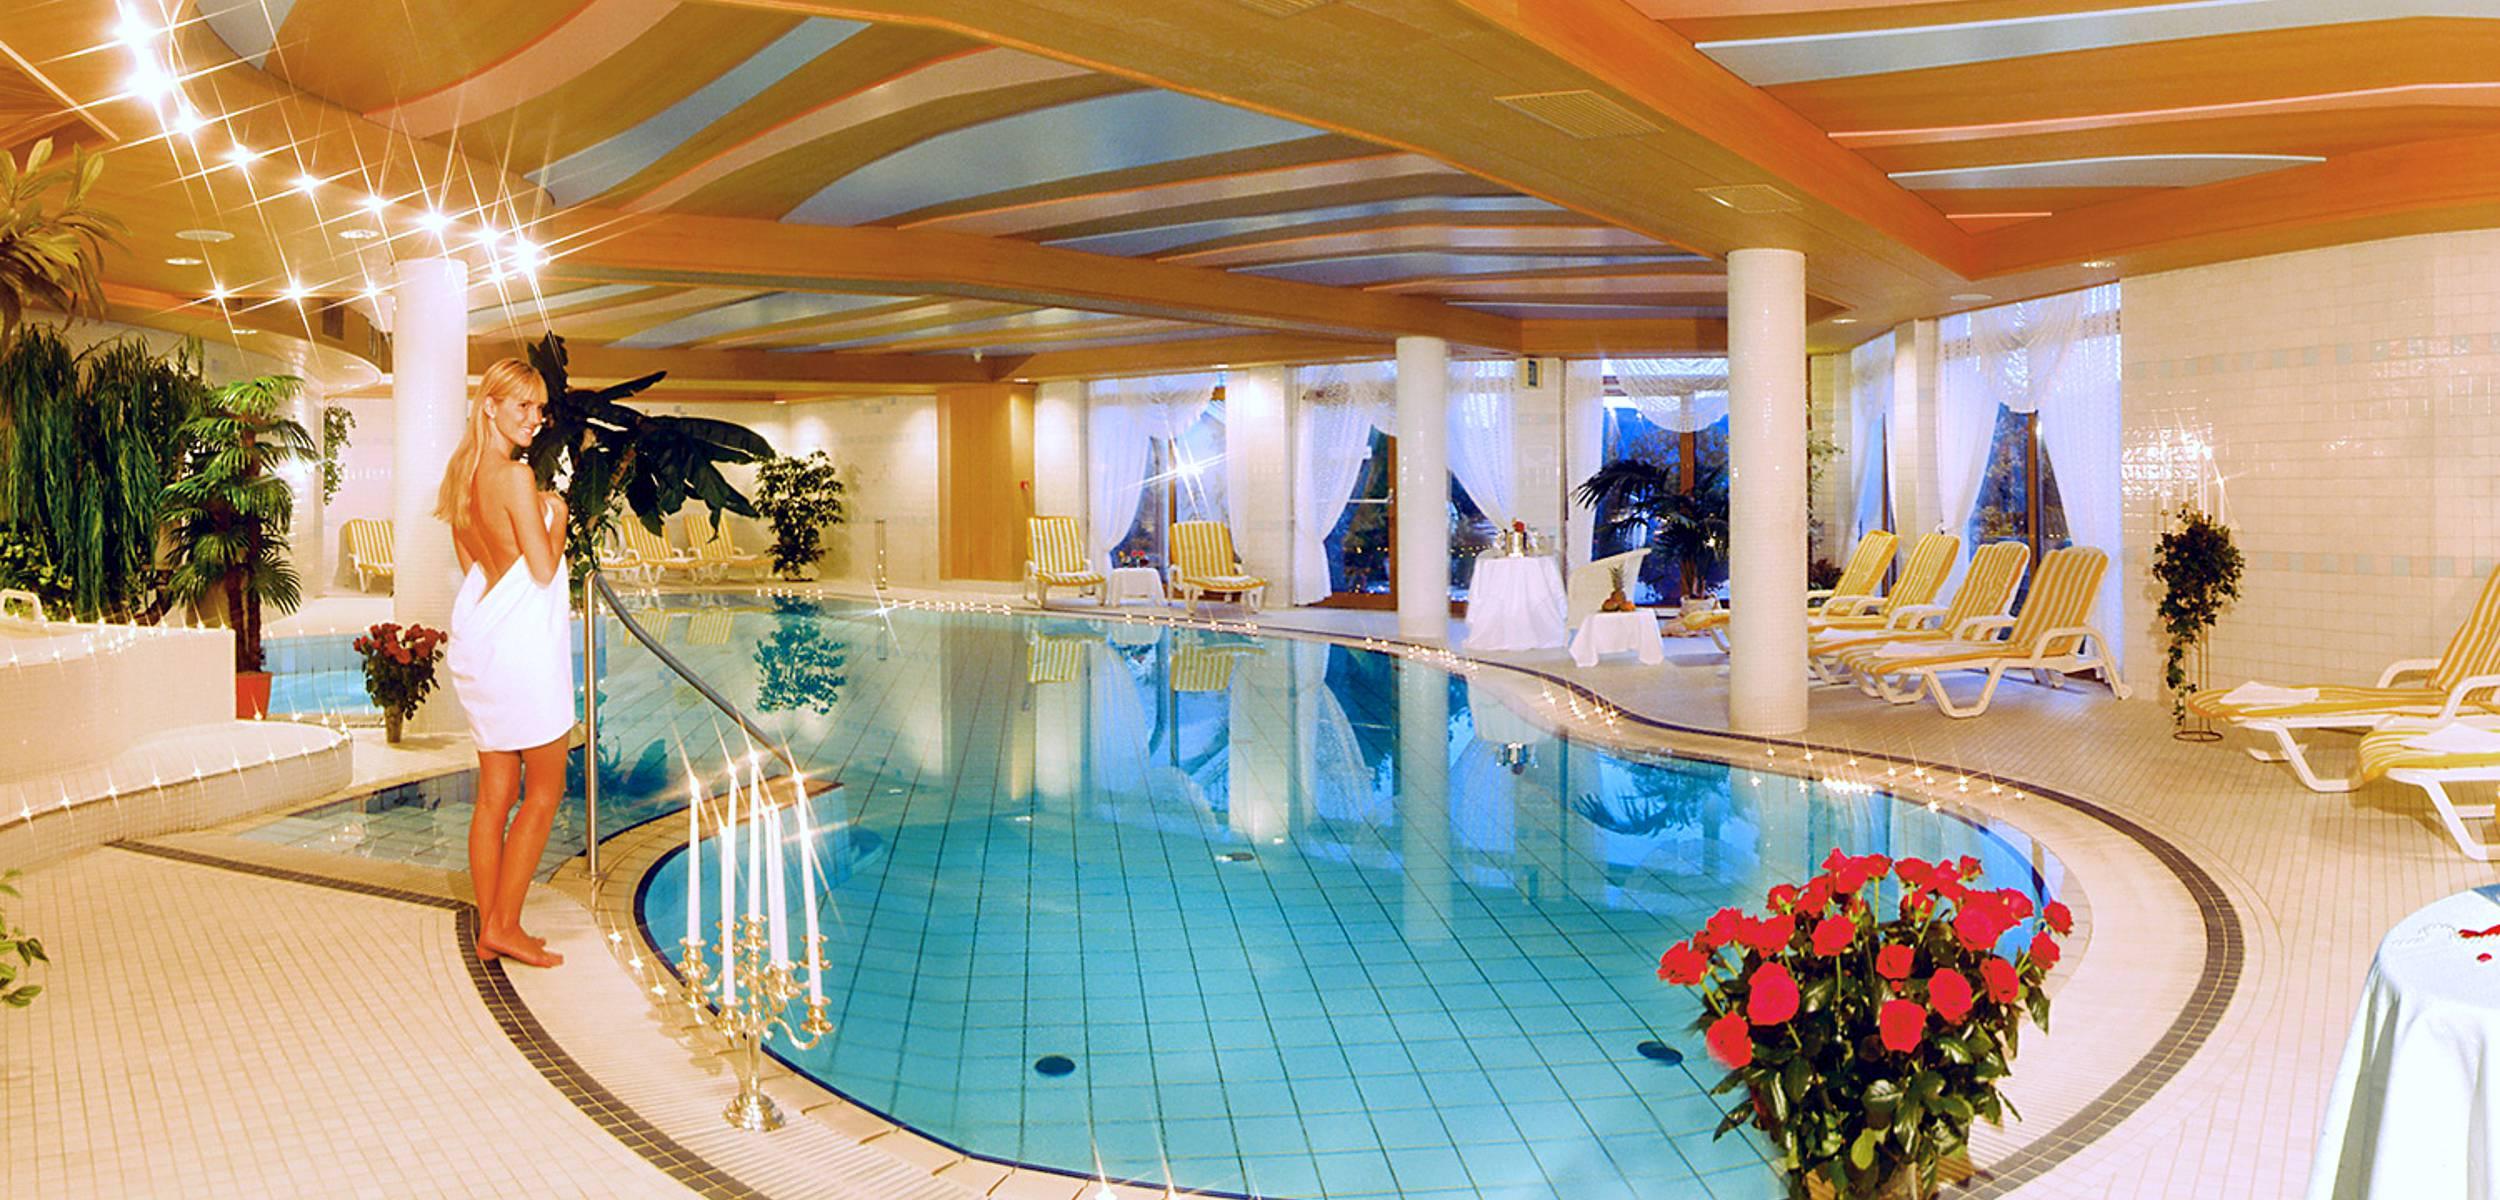 hotels in meran und umgebung mit pool hotel rimmele. Black Bedroom Furniture Sets. Home Design Ideas